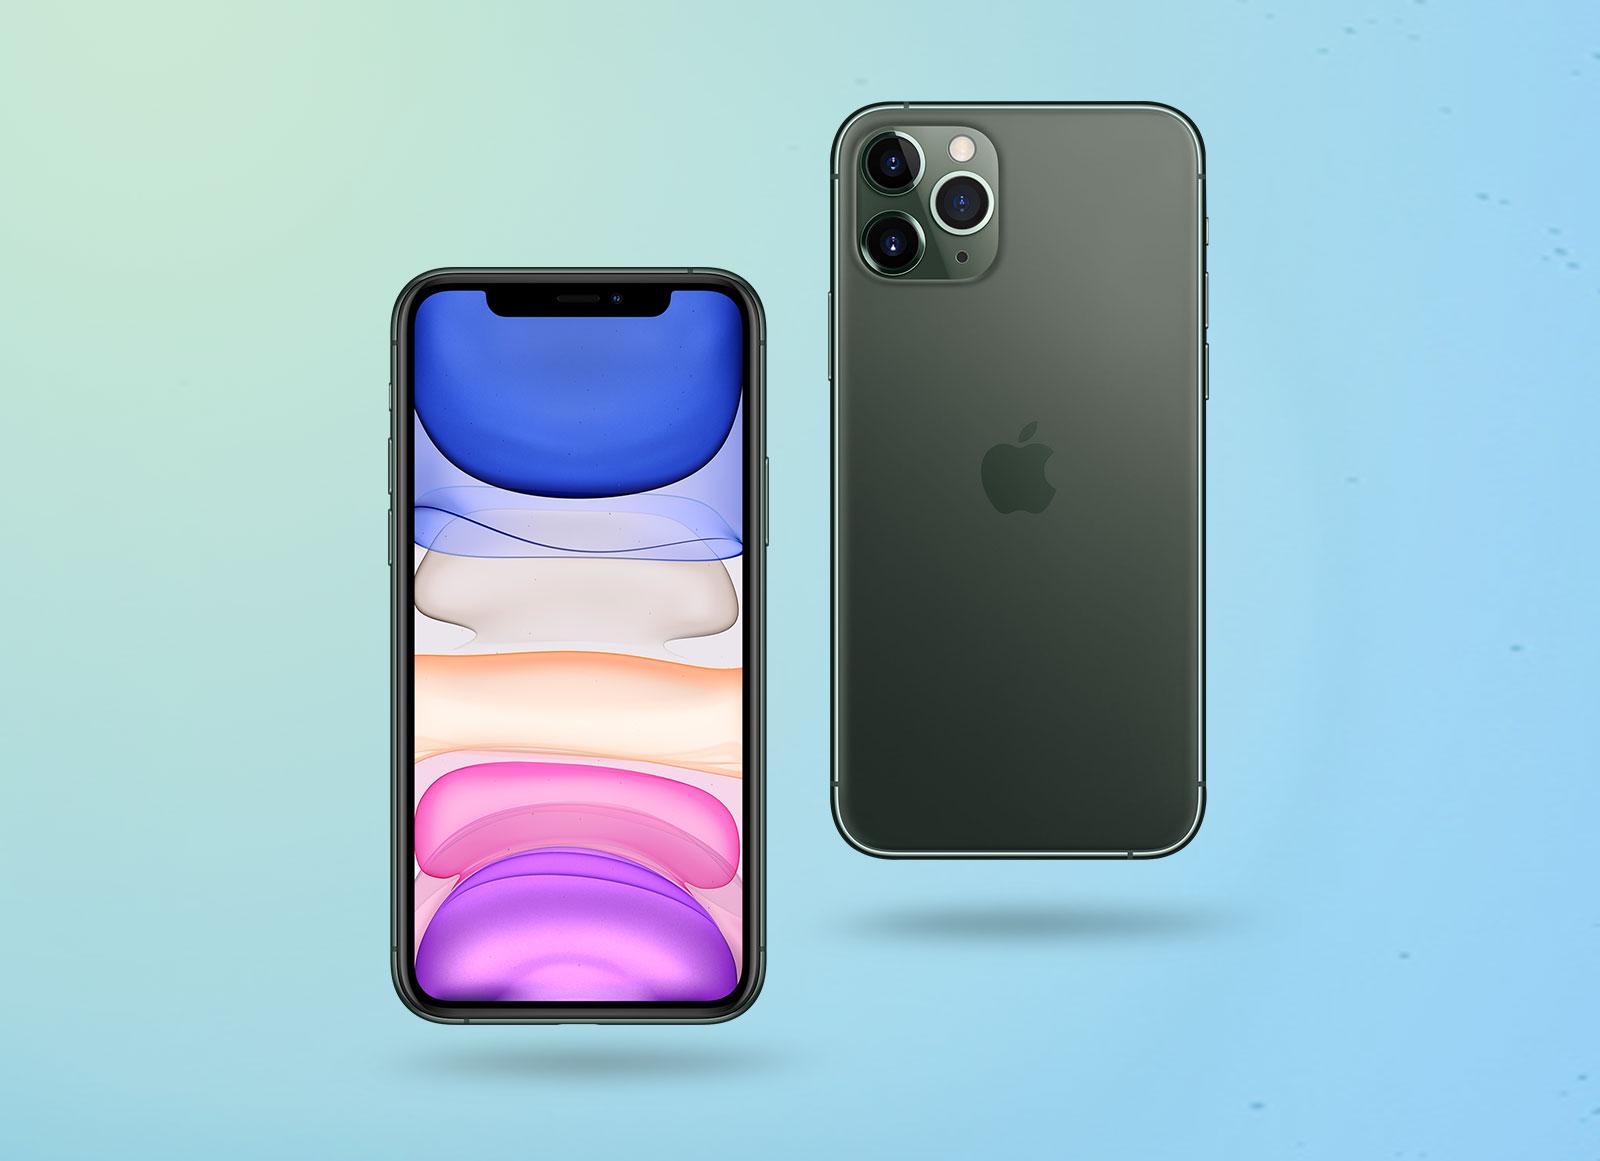 40 Iphone 11 Iphone 11 Pro Iphone 11 Pro Max Mockup